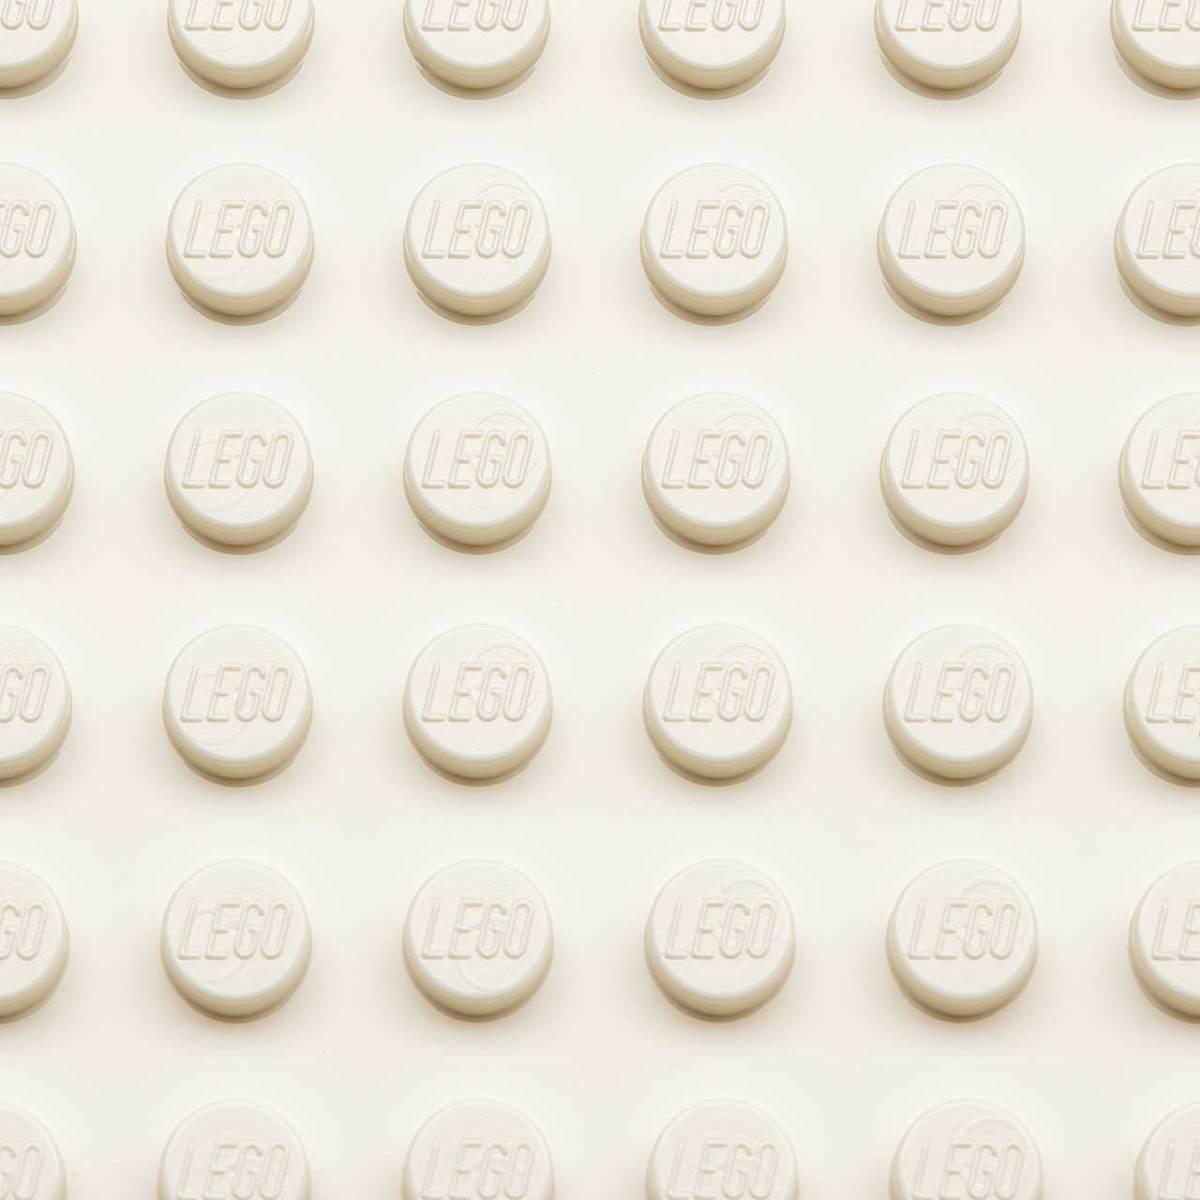 BYGGLEK-IKEA-Lego-storage-boxes-5